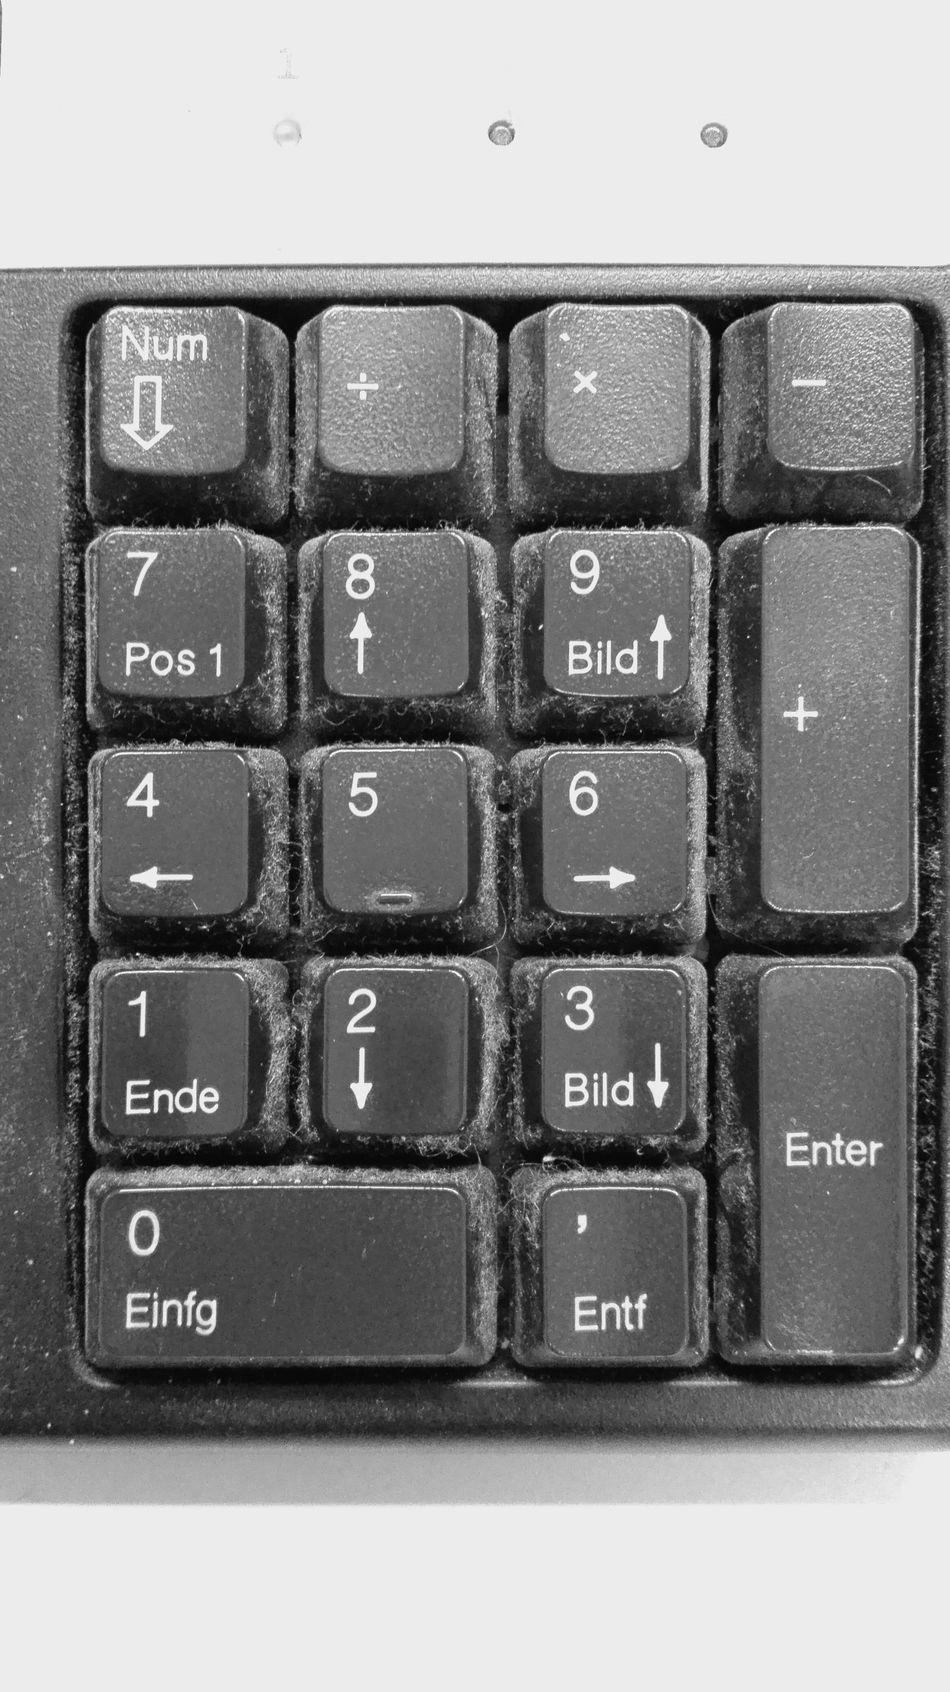 a dirty keyboard Alphabet Alphabet Buttons Close-up Communication Computer Computer Key Computer Keyboard Dirty Dirty Keyboard Dusty Keyboard Keyboard Computer Letters Manky Technology Text